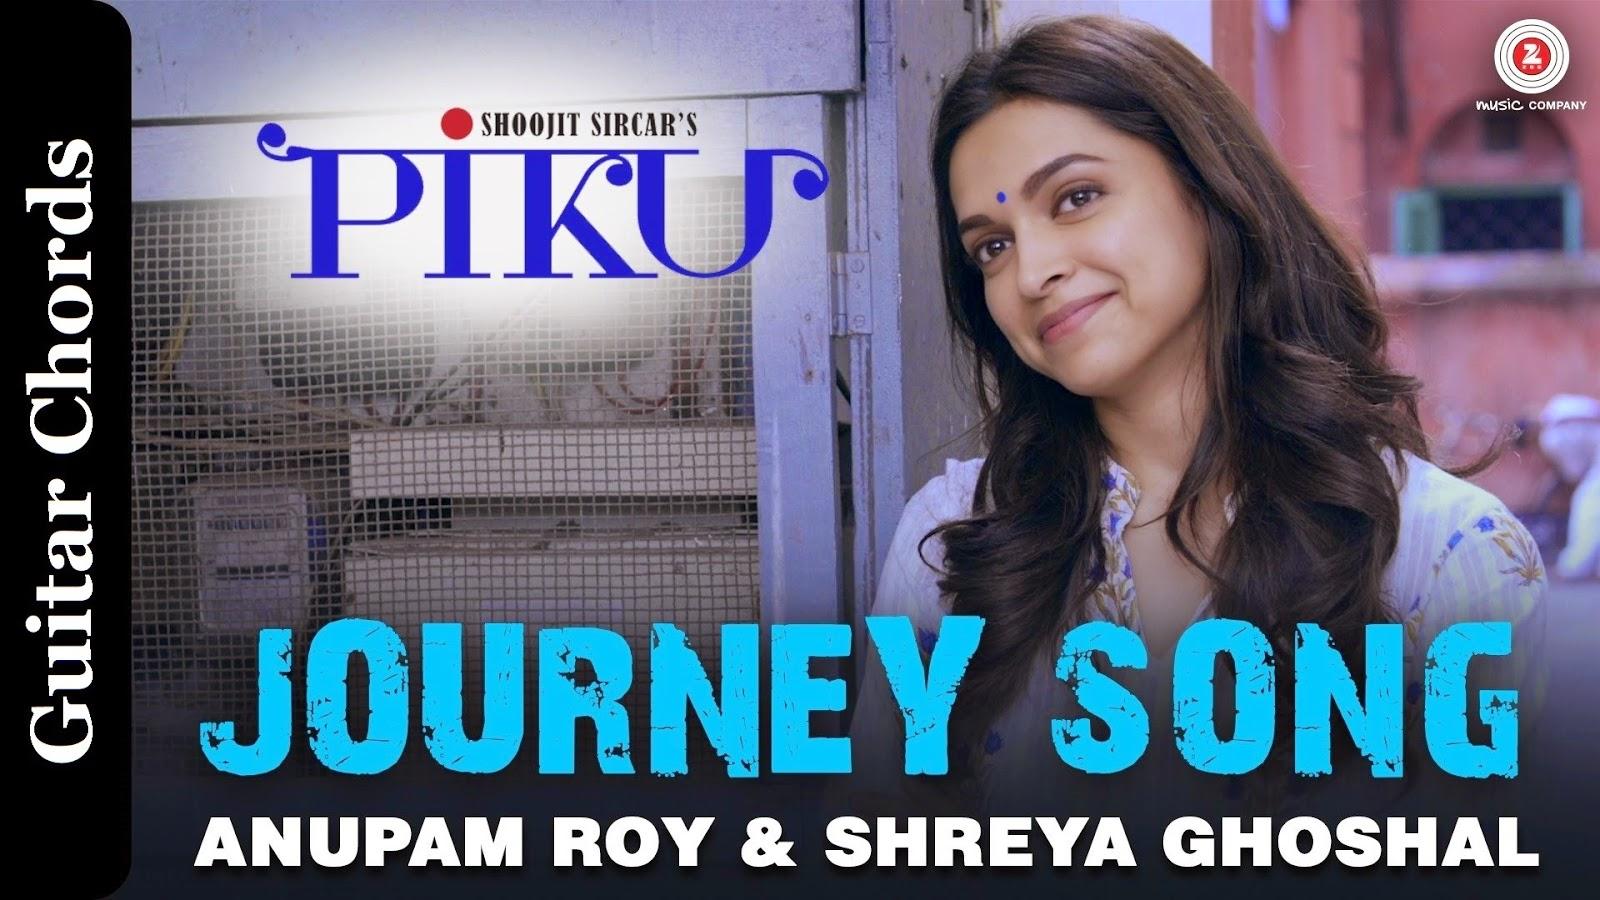 Journey Song Chords - PIKU Anupam Roy, Shreya Ghoshal